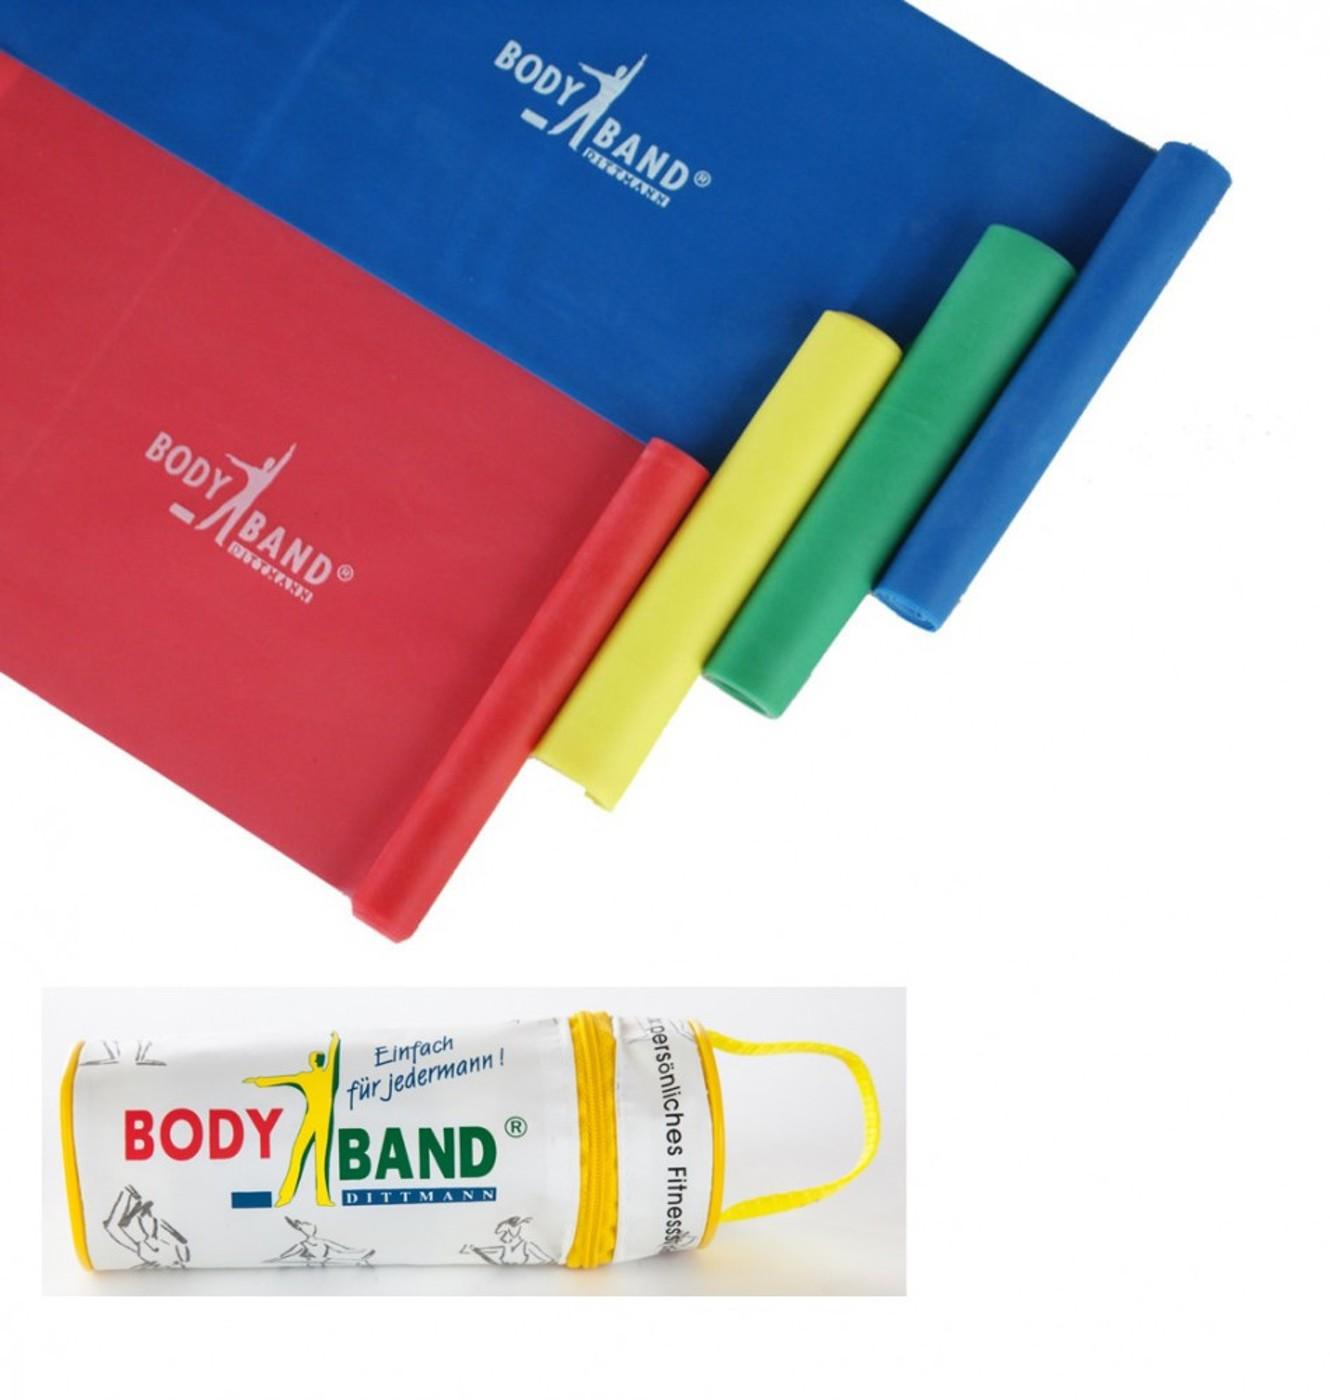 V3TEC Bodyband 2,5mx14,5cmx0,15mm